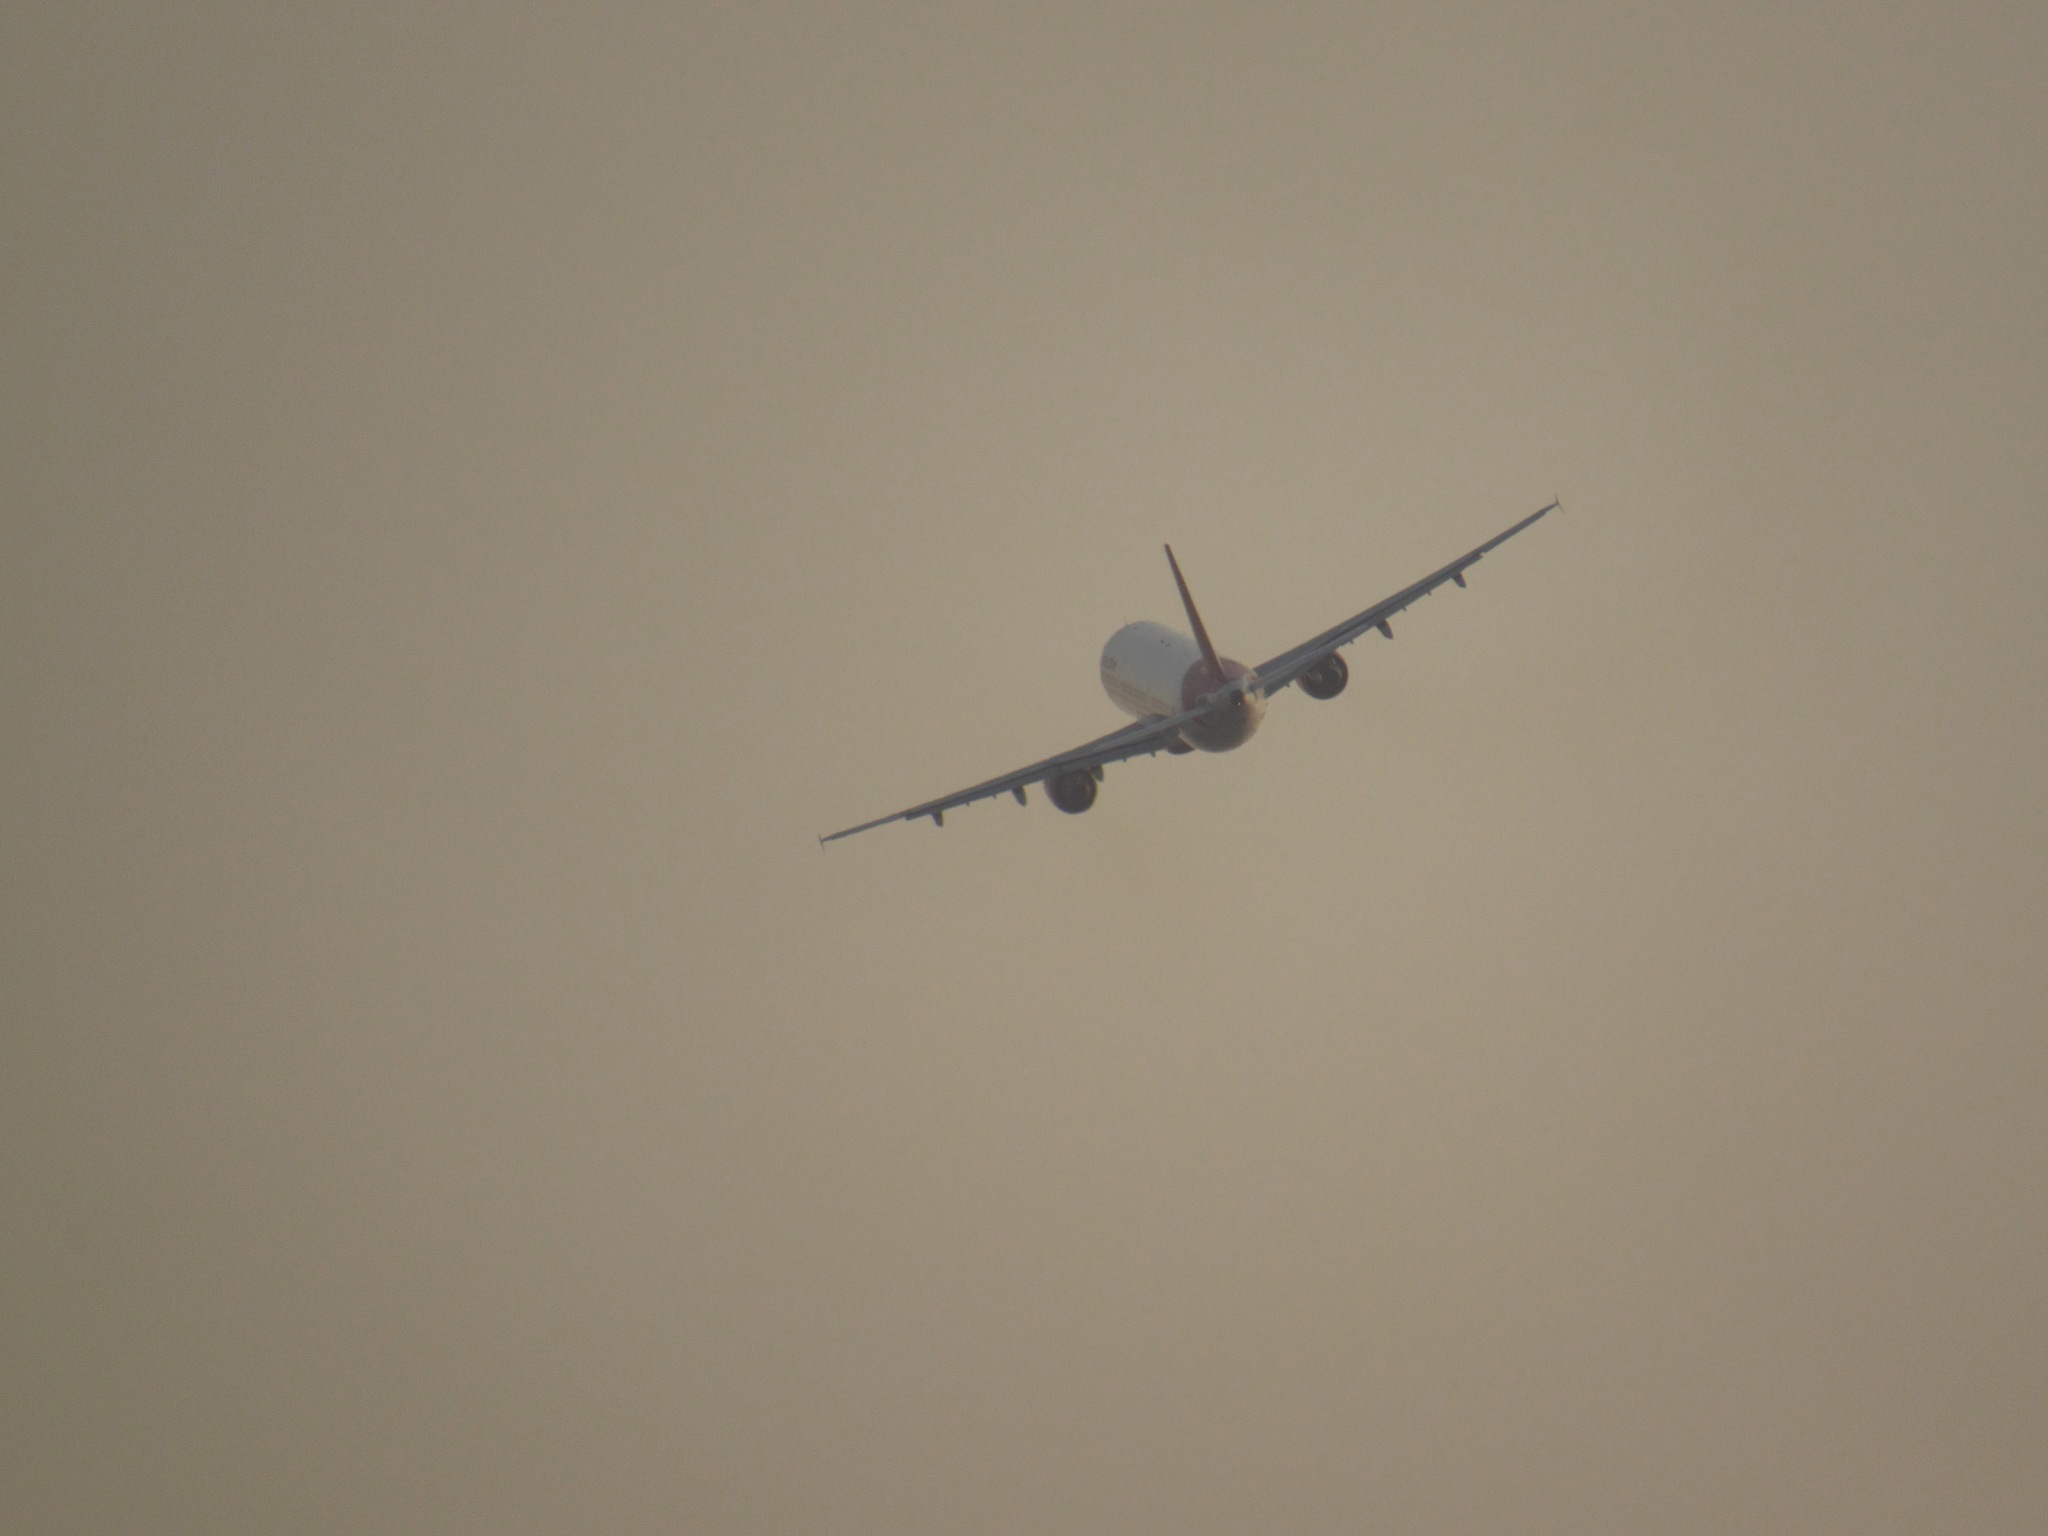 Fly higher by Pranav Bhardwaj (city.live)